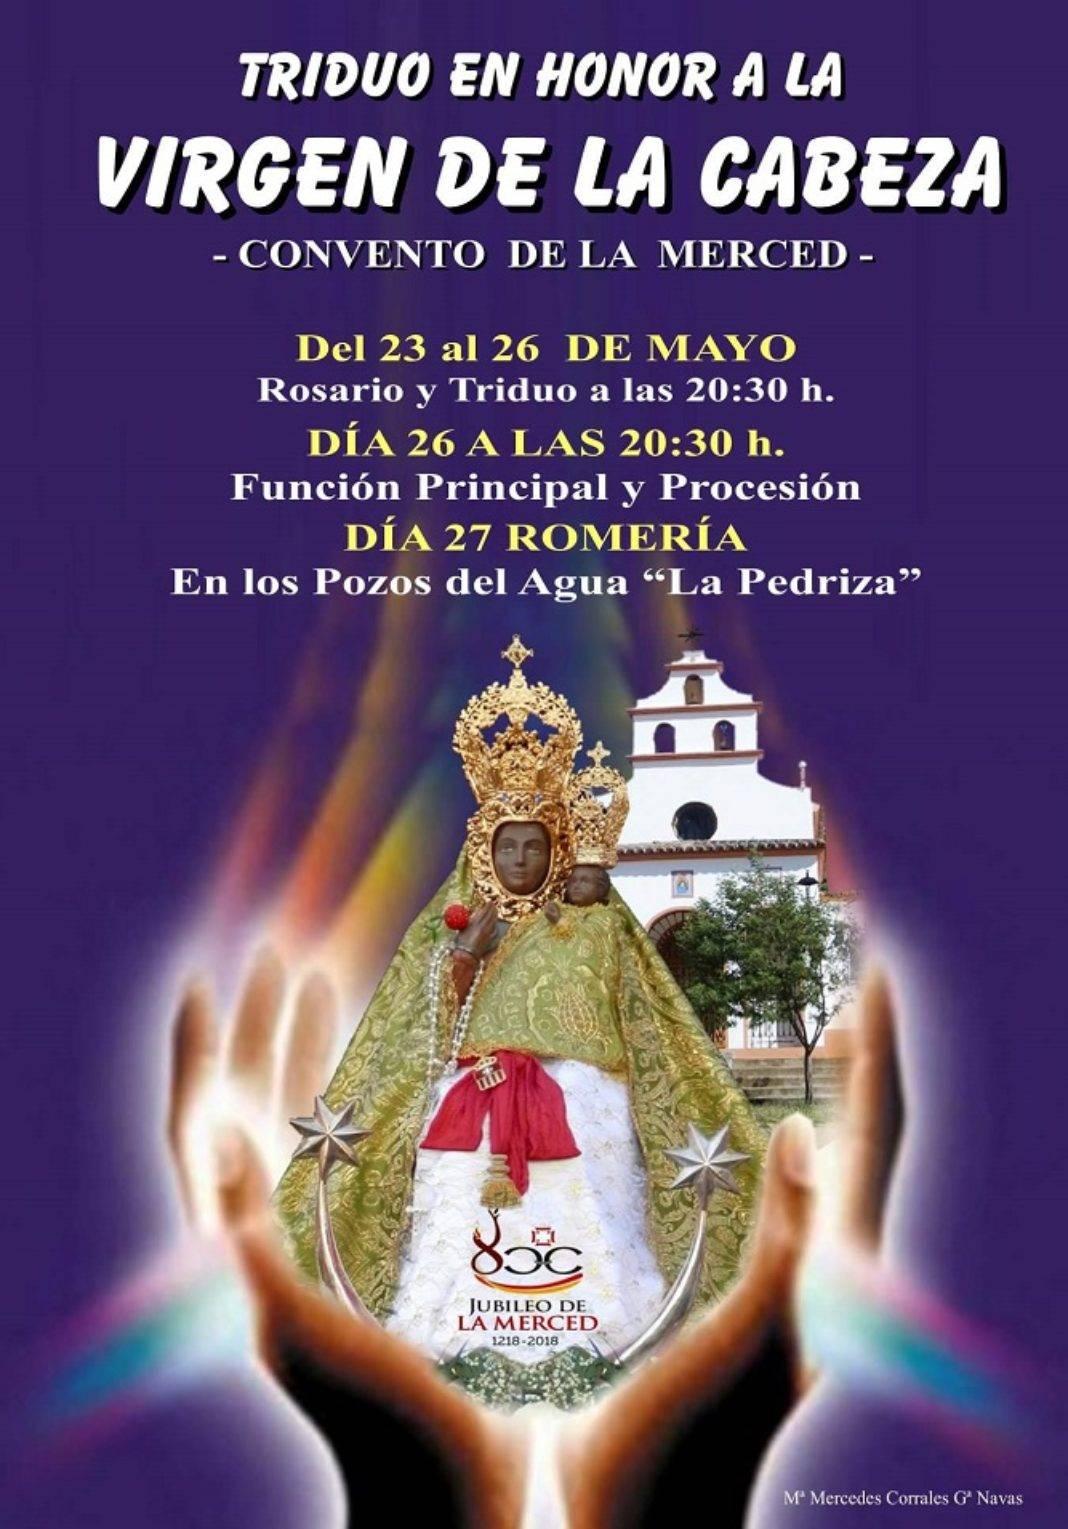 Romería Virgen de la Cabeza 1068x1529 - Este fin de semana romería en honor de la Virgen de la Cabeza